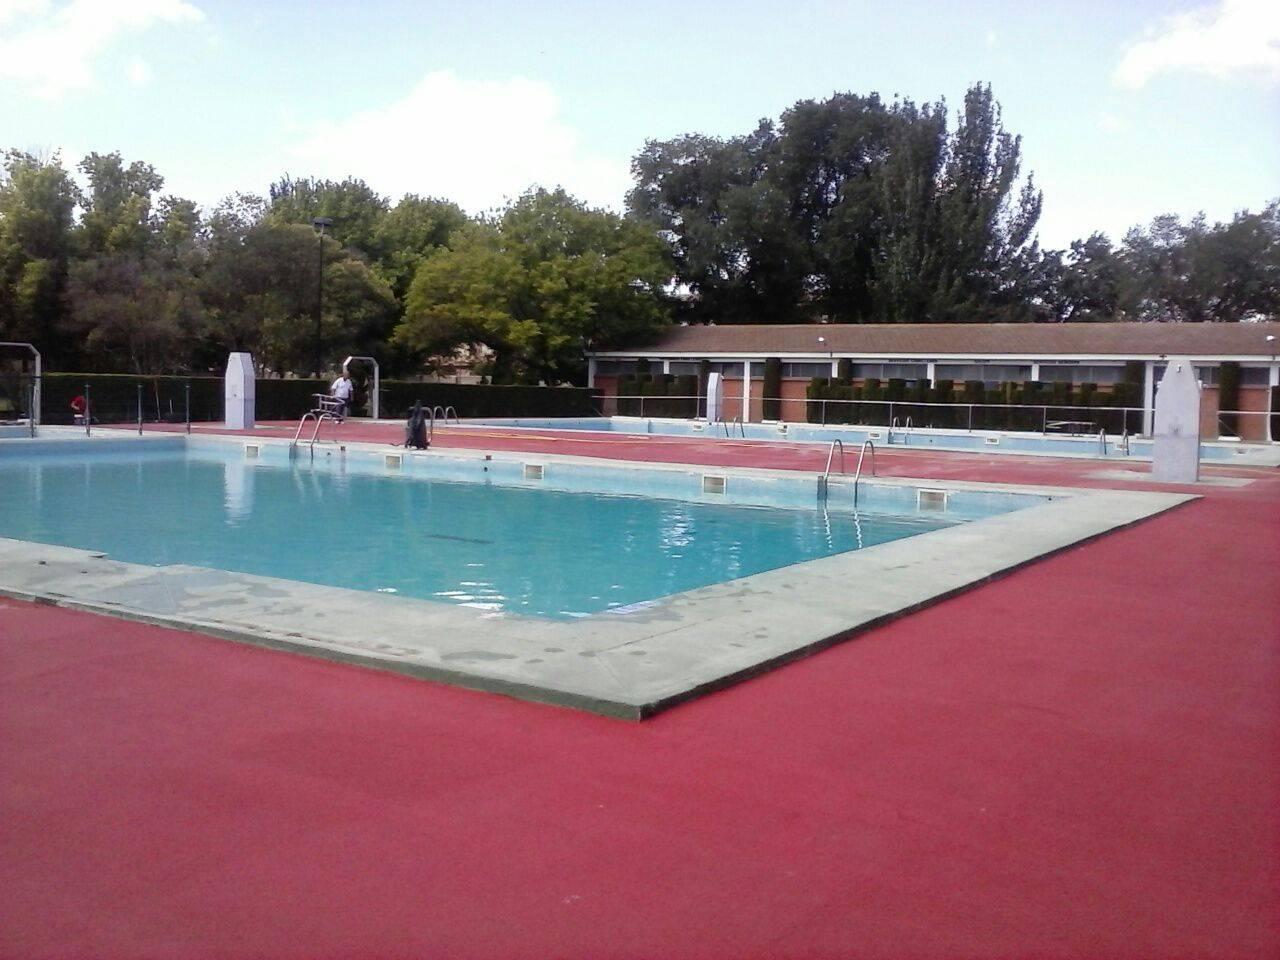 piscina municipal de herencia - Inauguración oficial de la campaña de verano de piscina